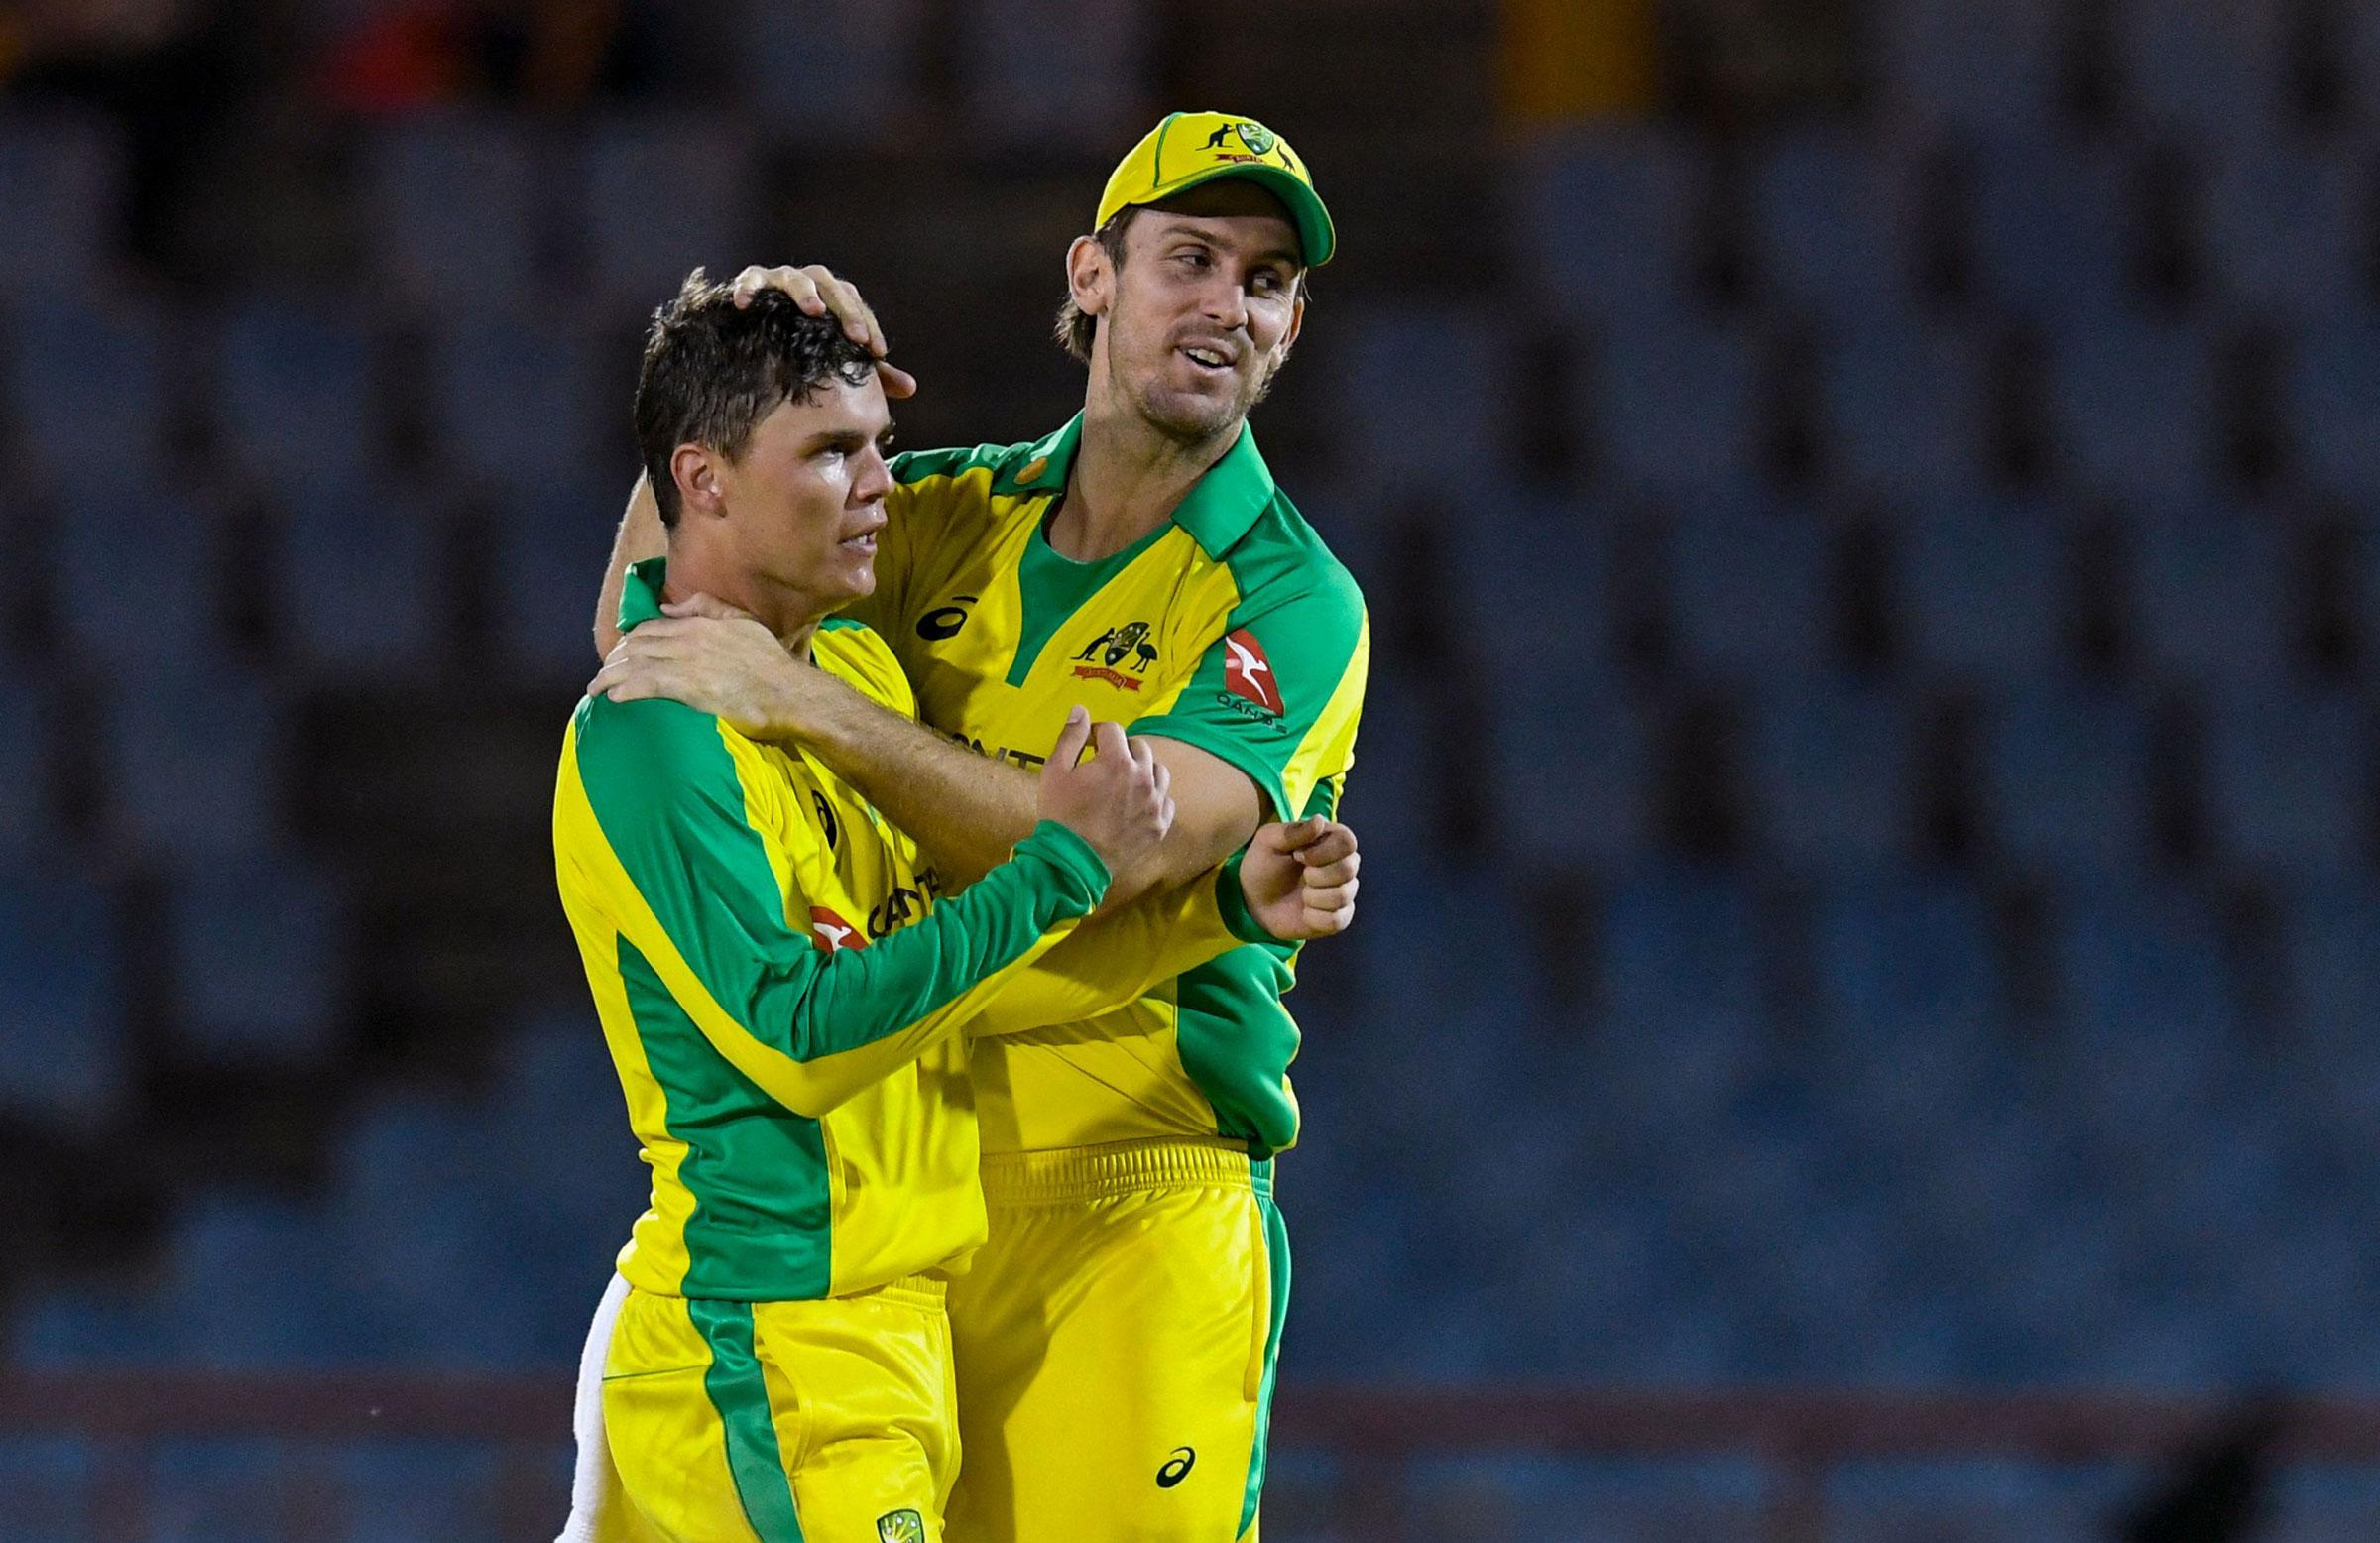 Swepson celebrates a wicket during Australia's Windies tour // Getty